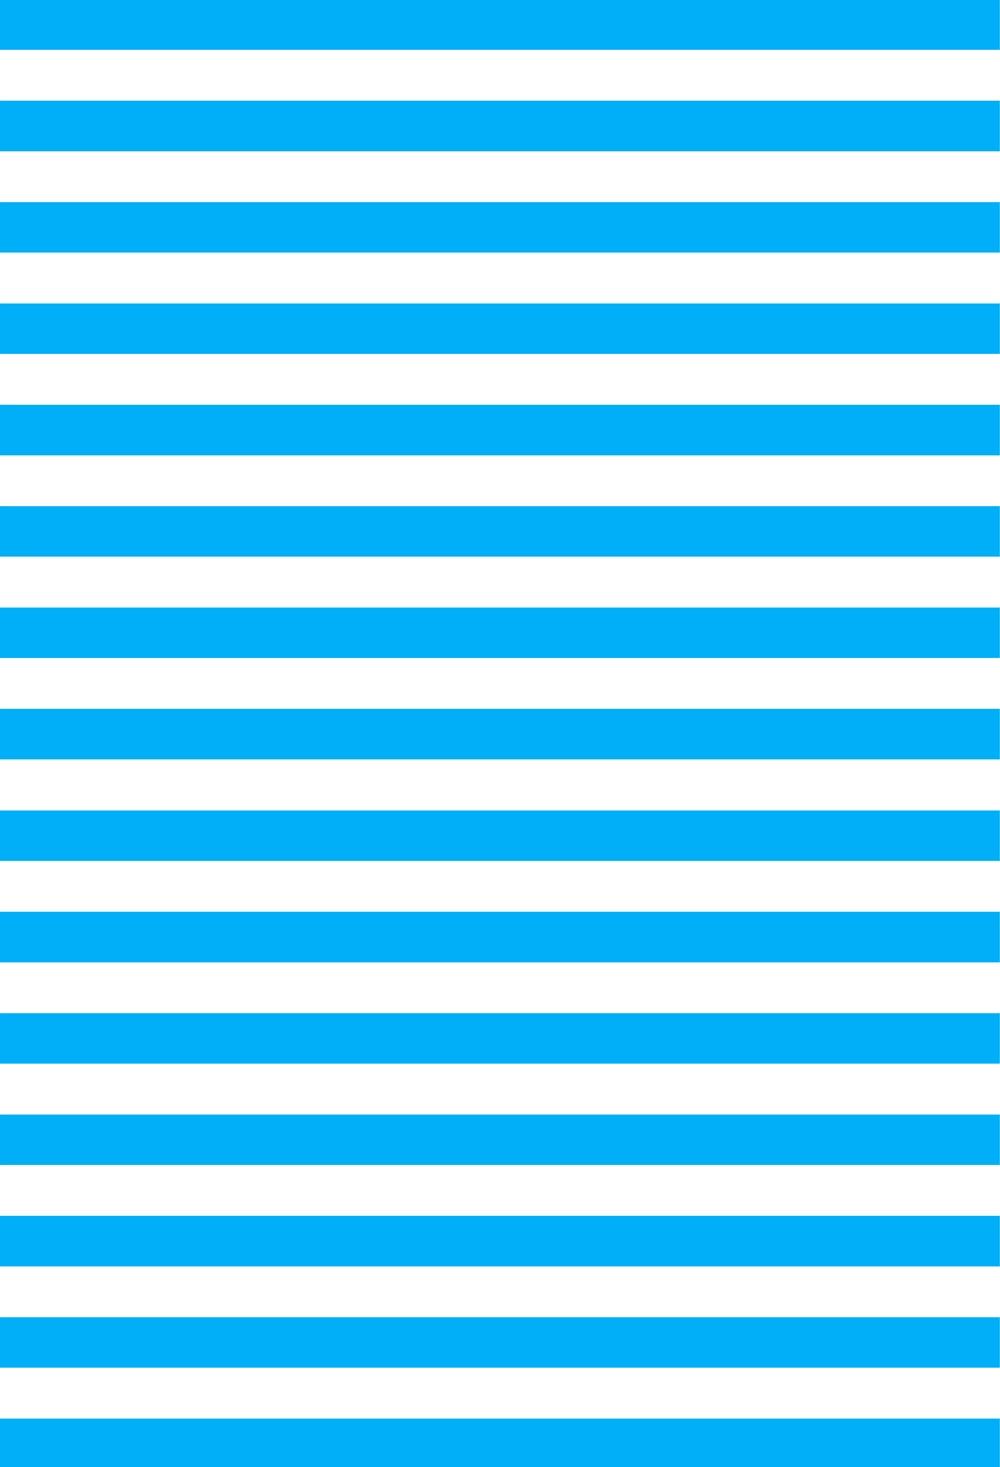 HUAYI Blue White Stripe Backgrounds Photo Backdrop Wedding Drop Fabric Newborn Photography Backdrops For Photo Studio